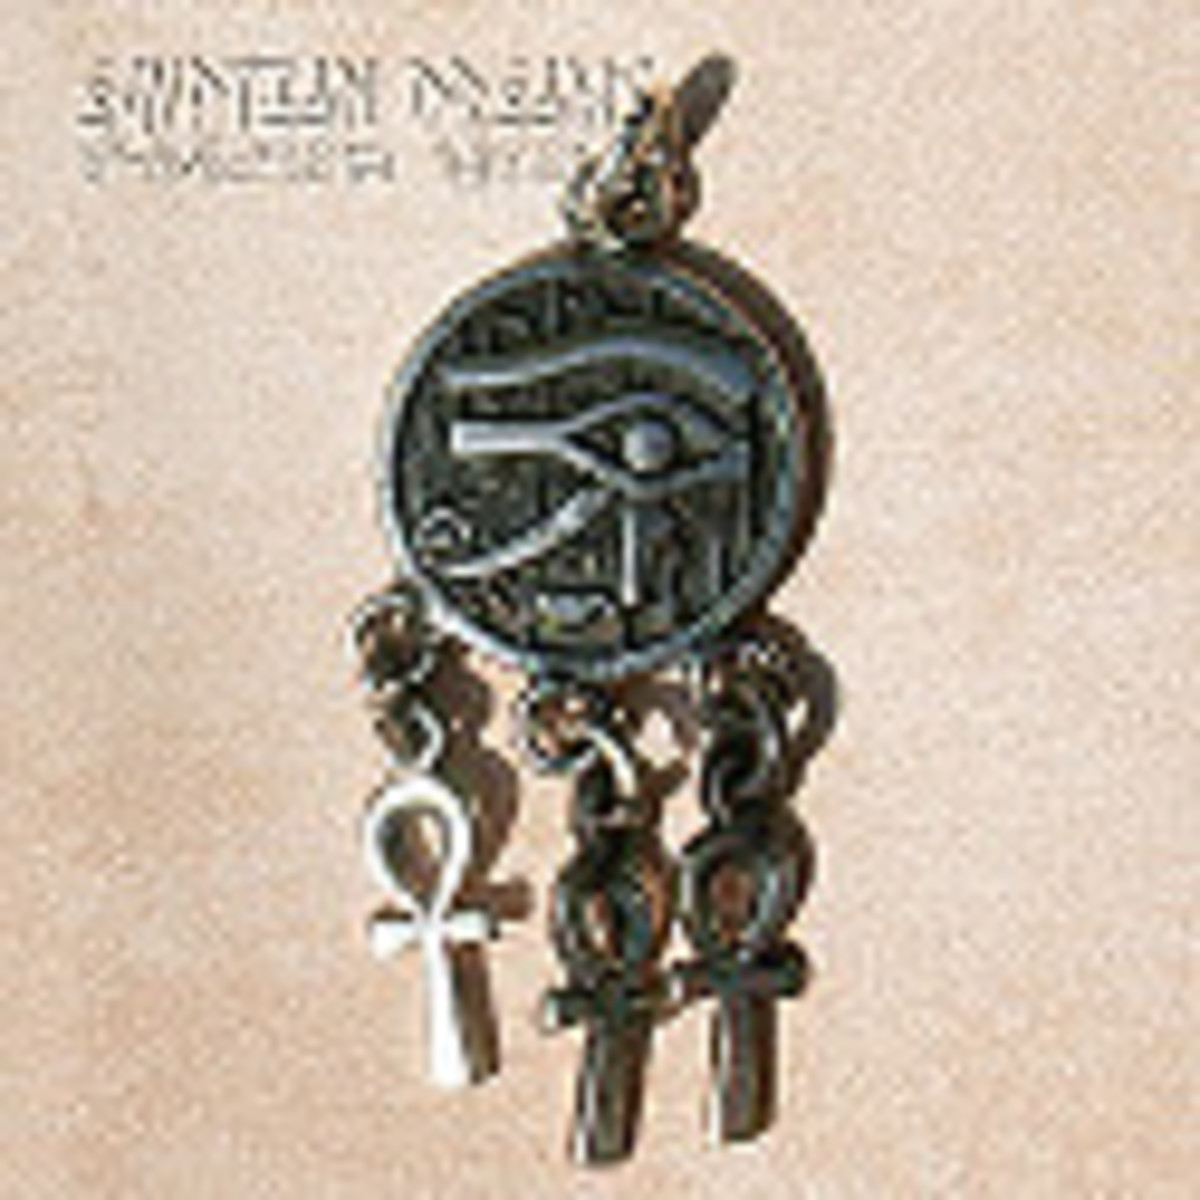 The eye of Horus and ankh symbols (fertility symbols - note the cross shape).